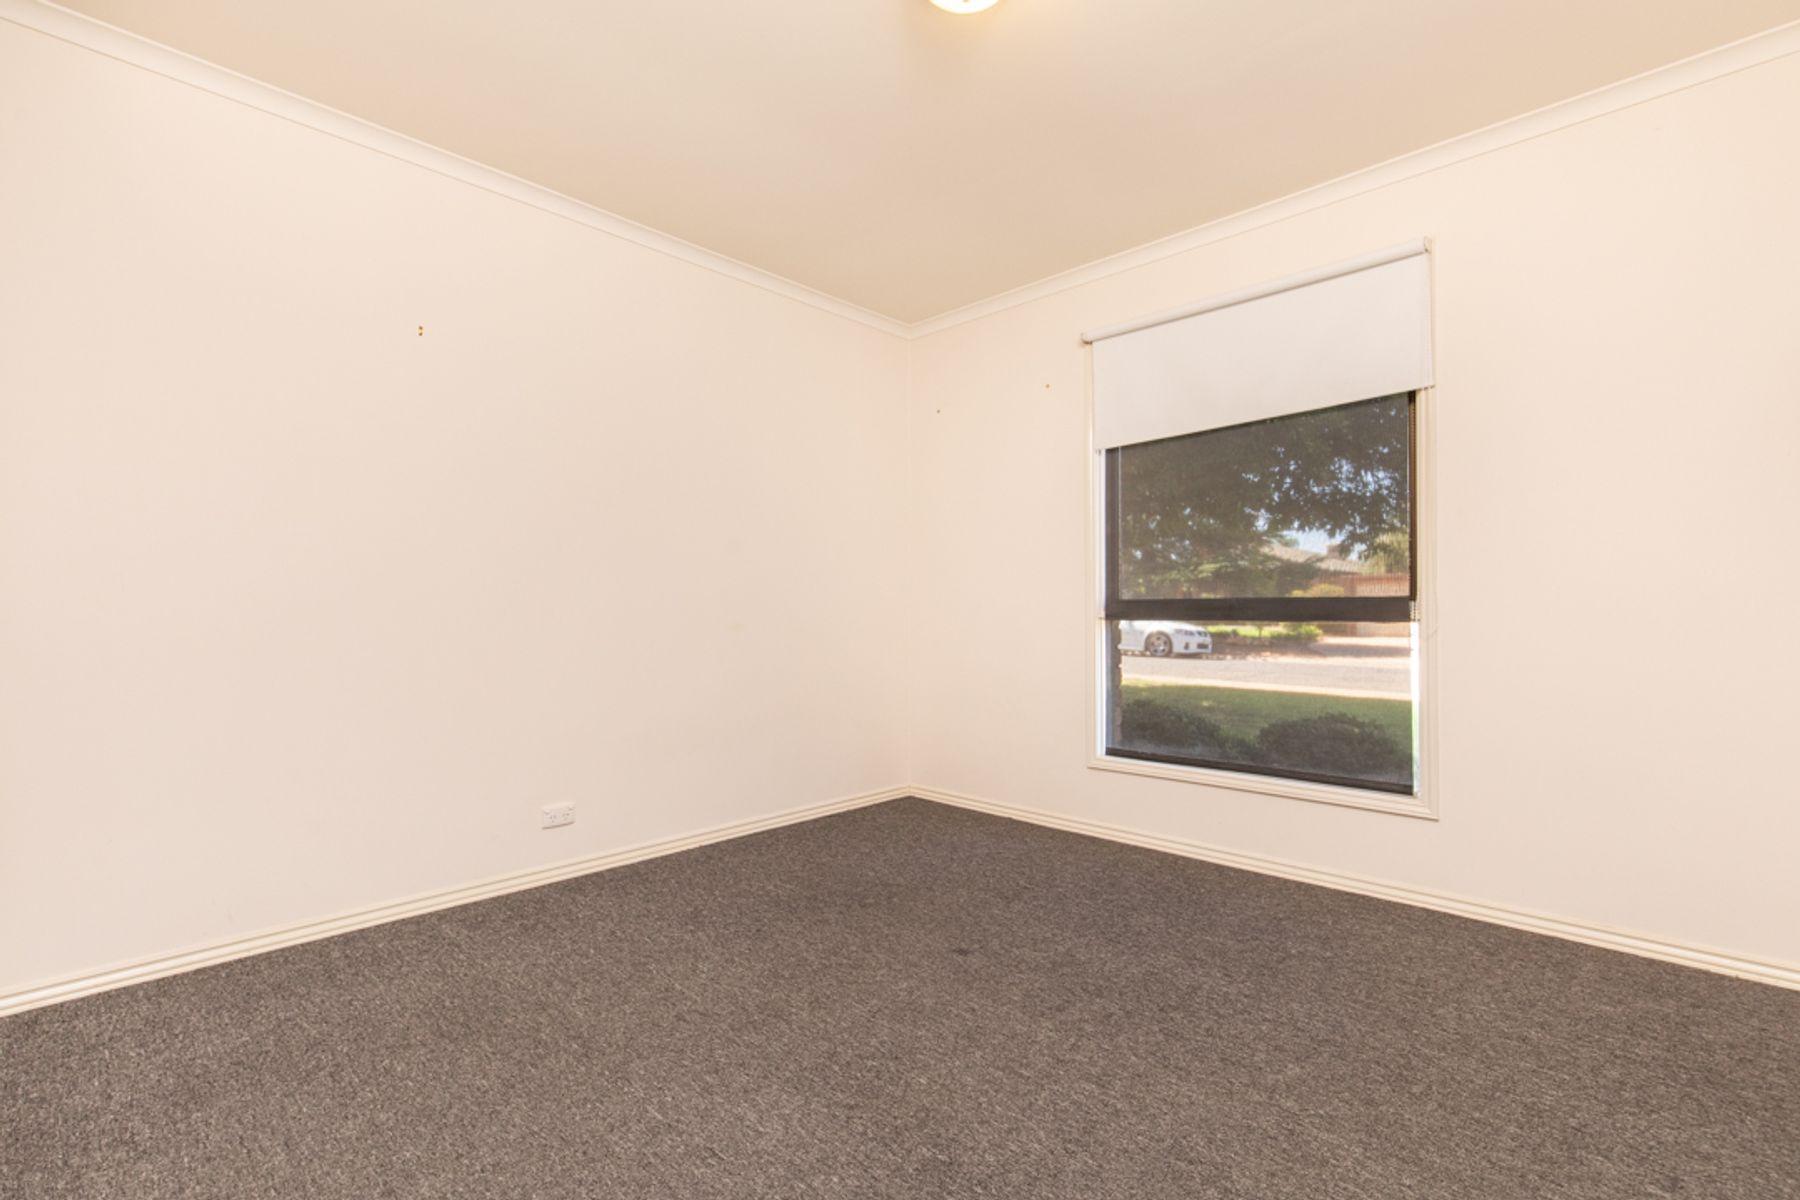 3 Symonds Court, Mildura, VIC 3500